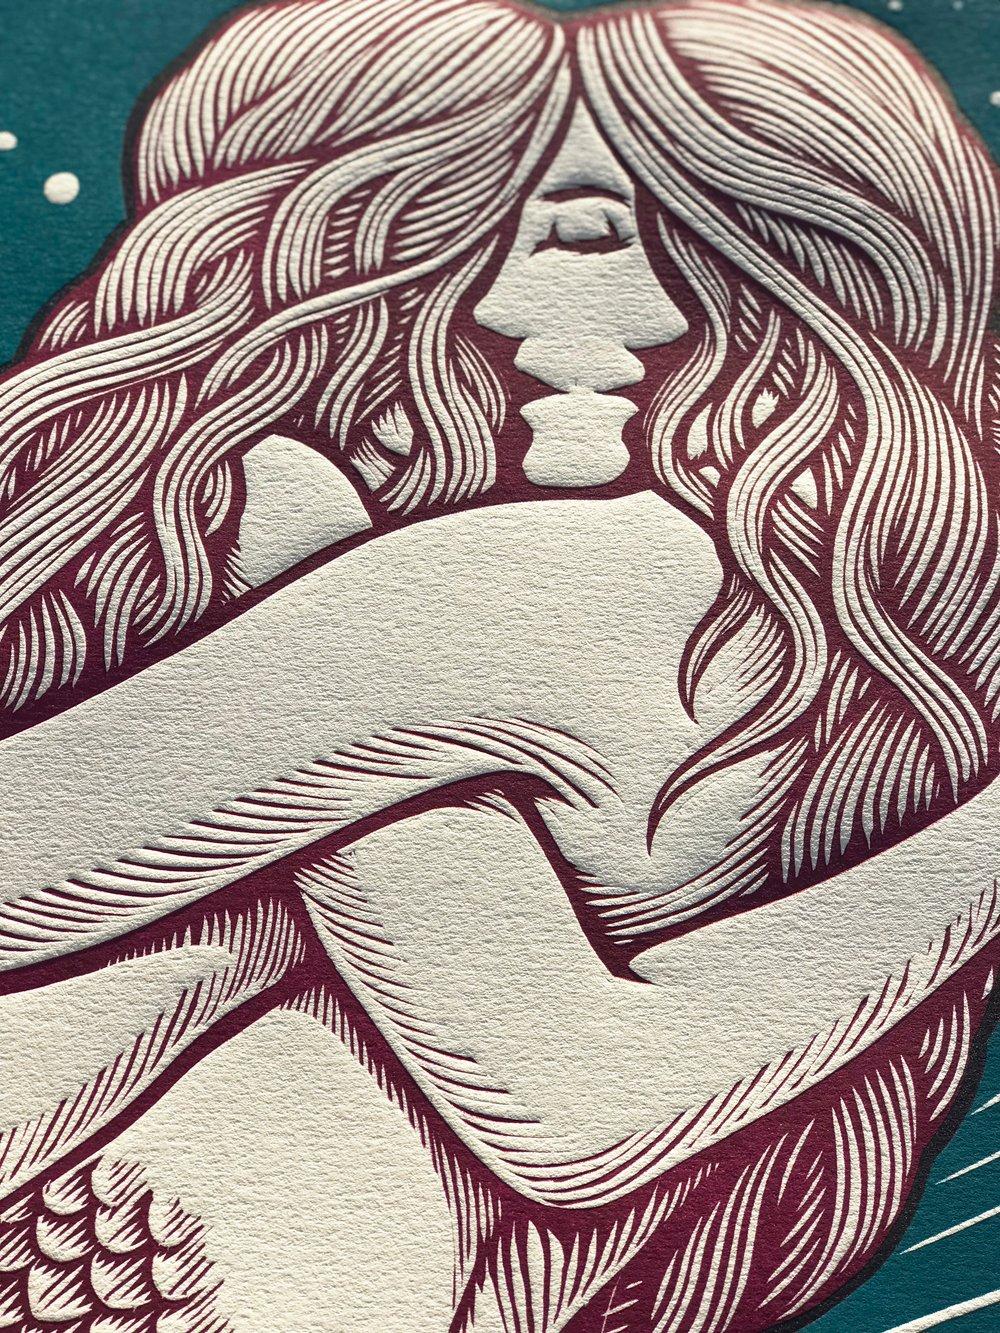 Closeness - Wine colored Mermaids